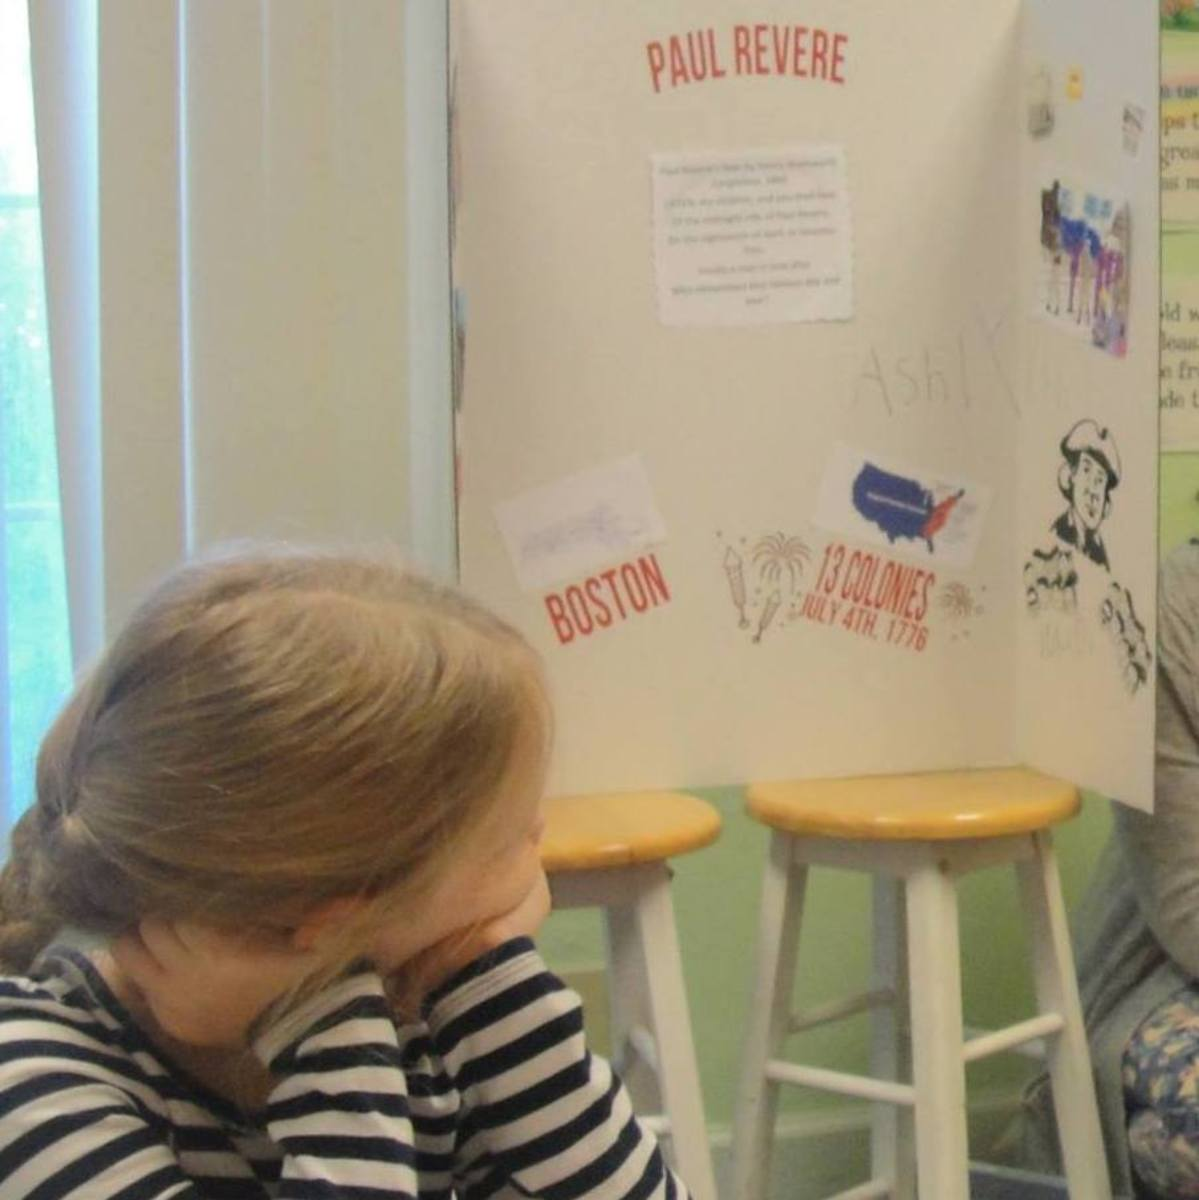 Student biography presentation on Paul Revere